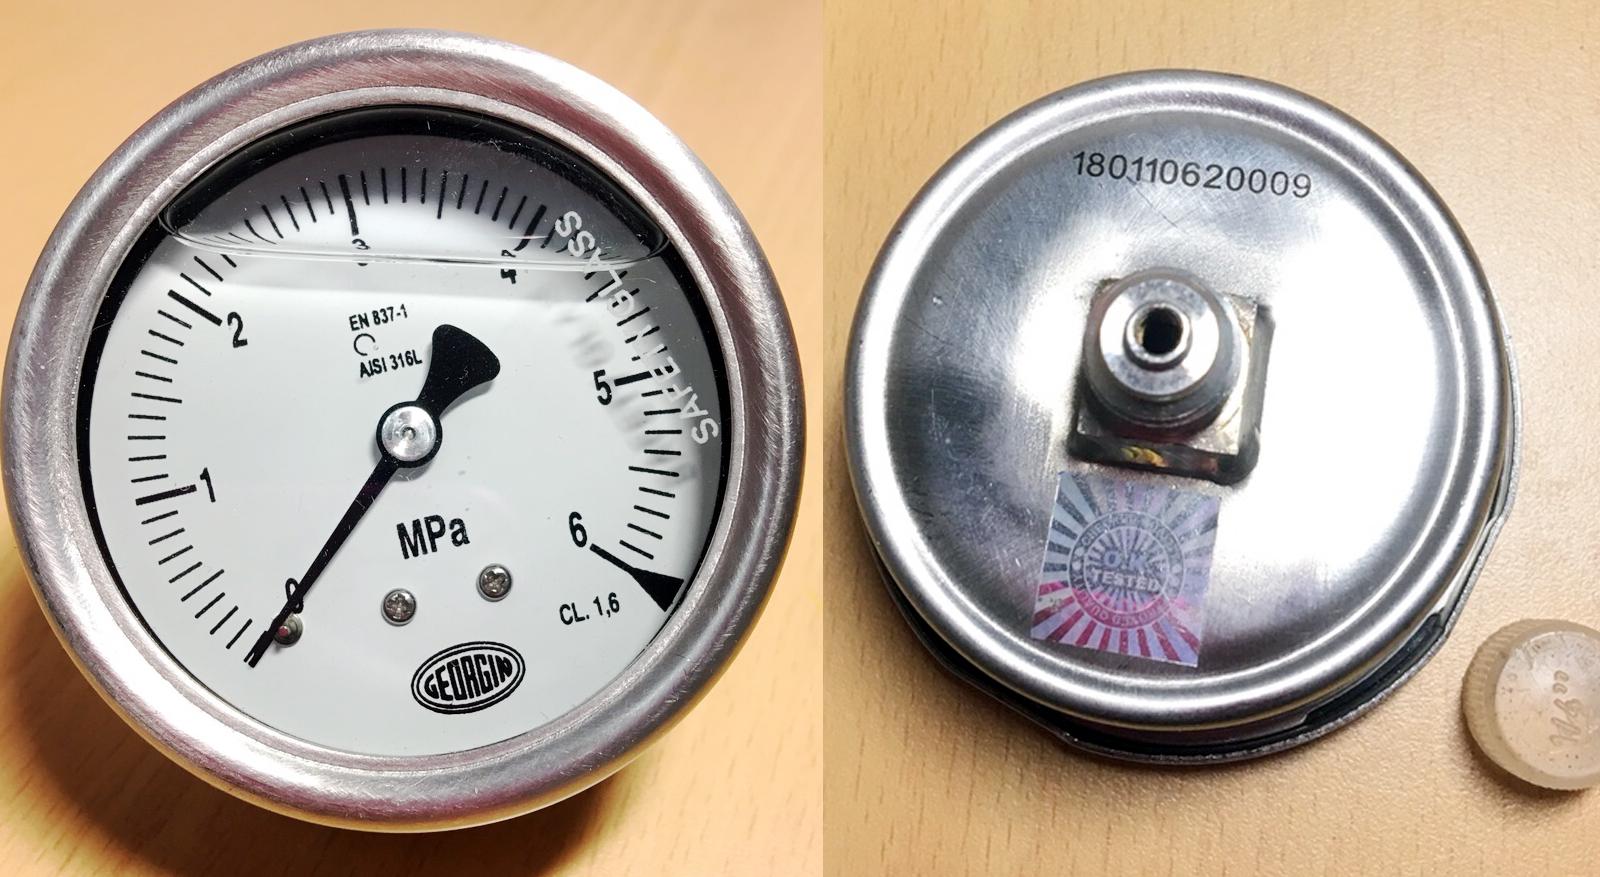 đồng hồ áp suất chân sau